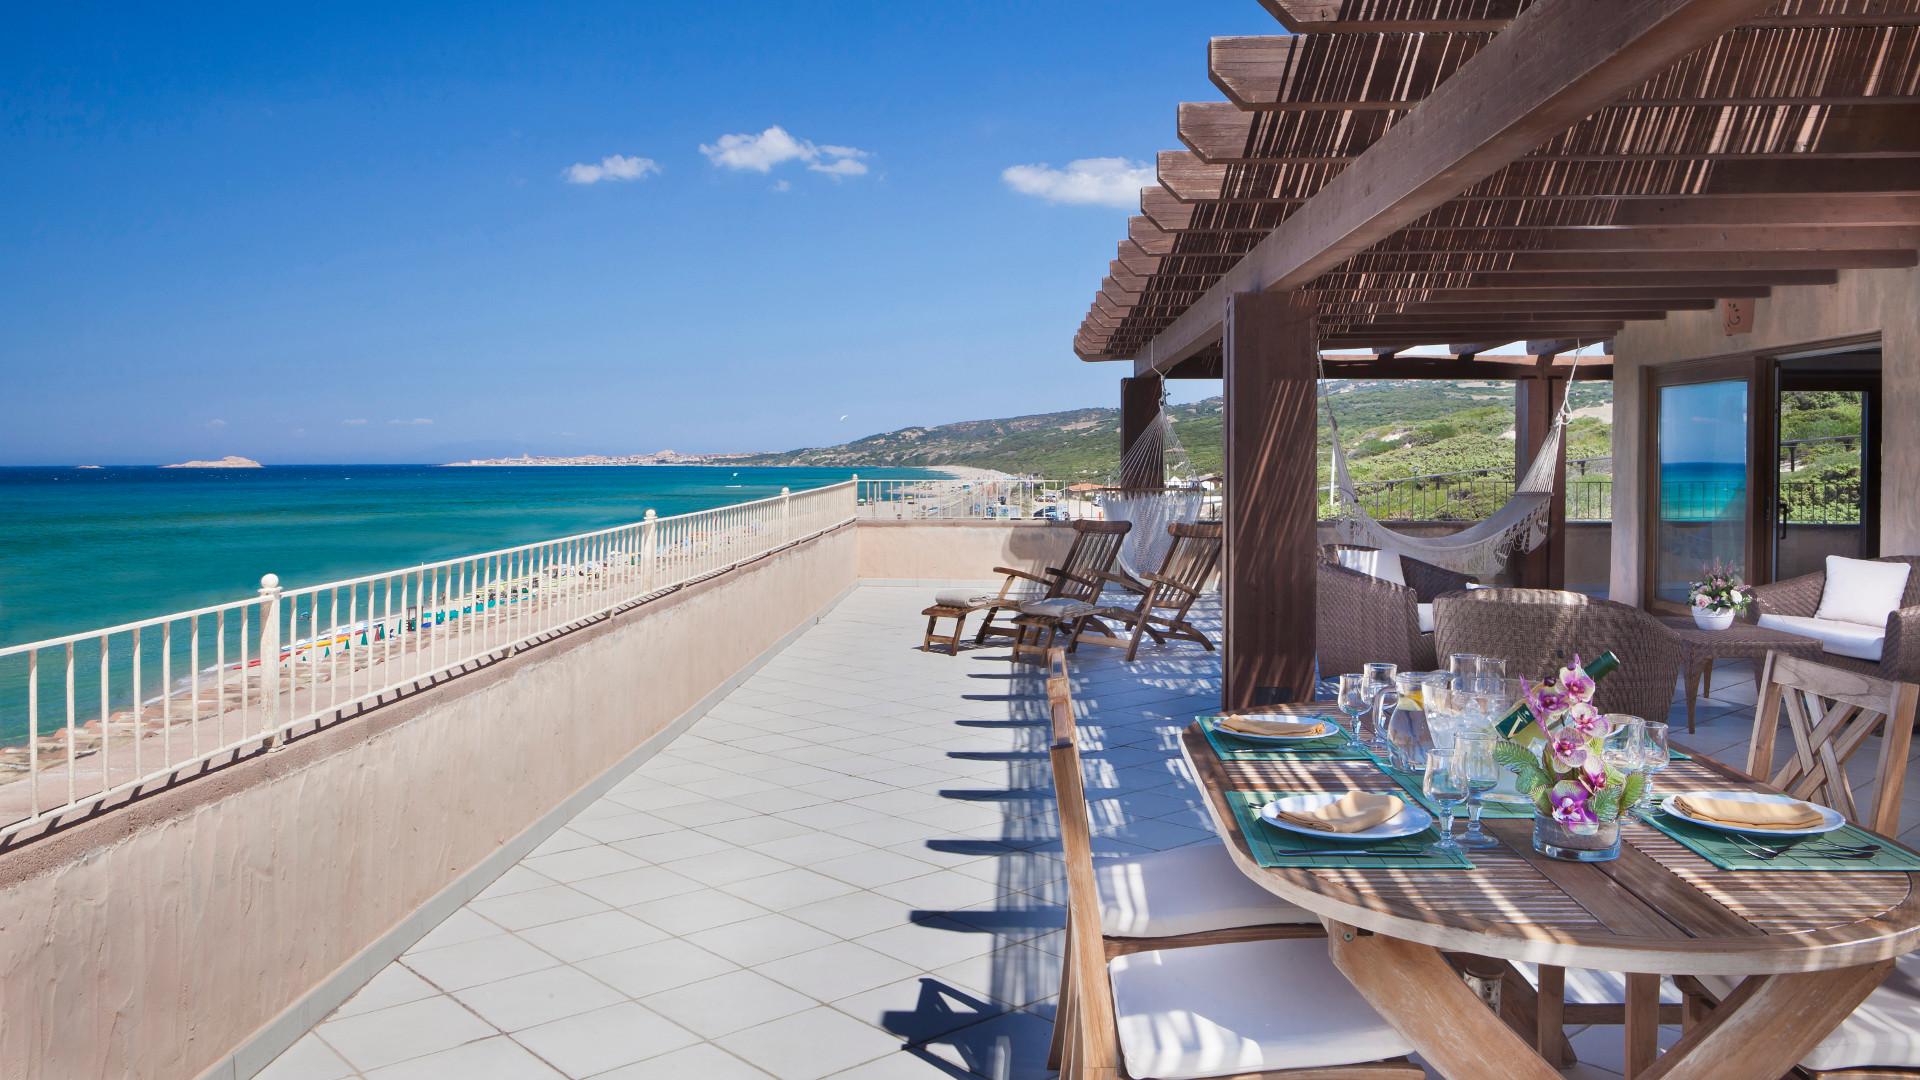 resort-le-dune-slider-duna-bianca-vista-mare-badesi-2